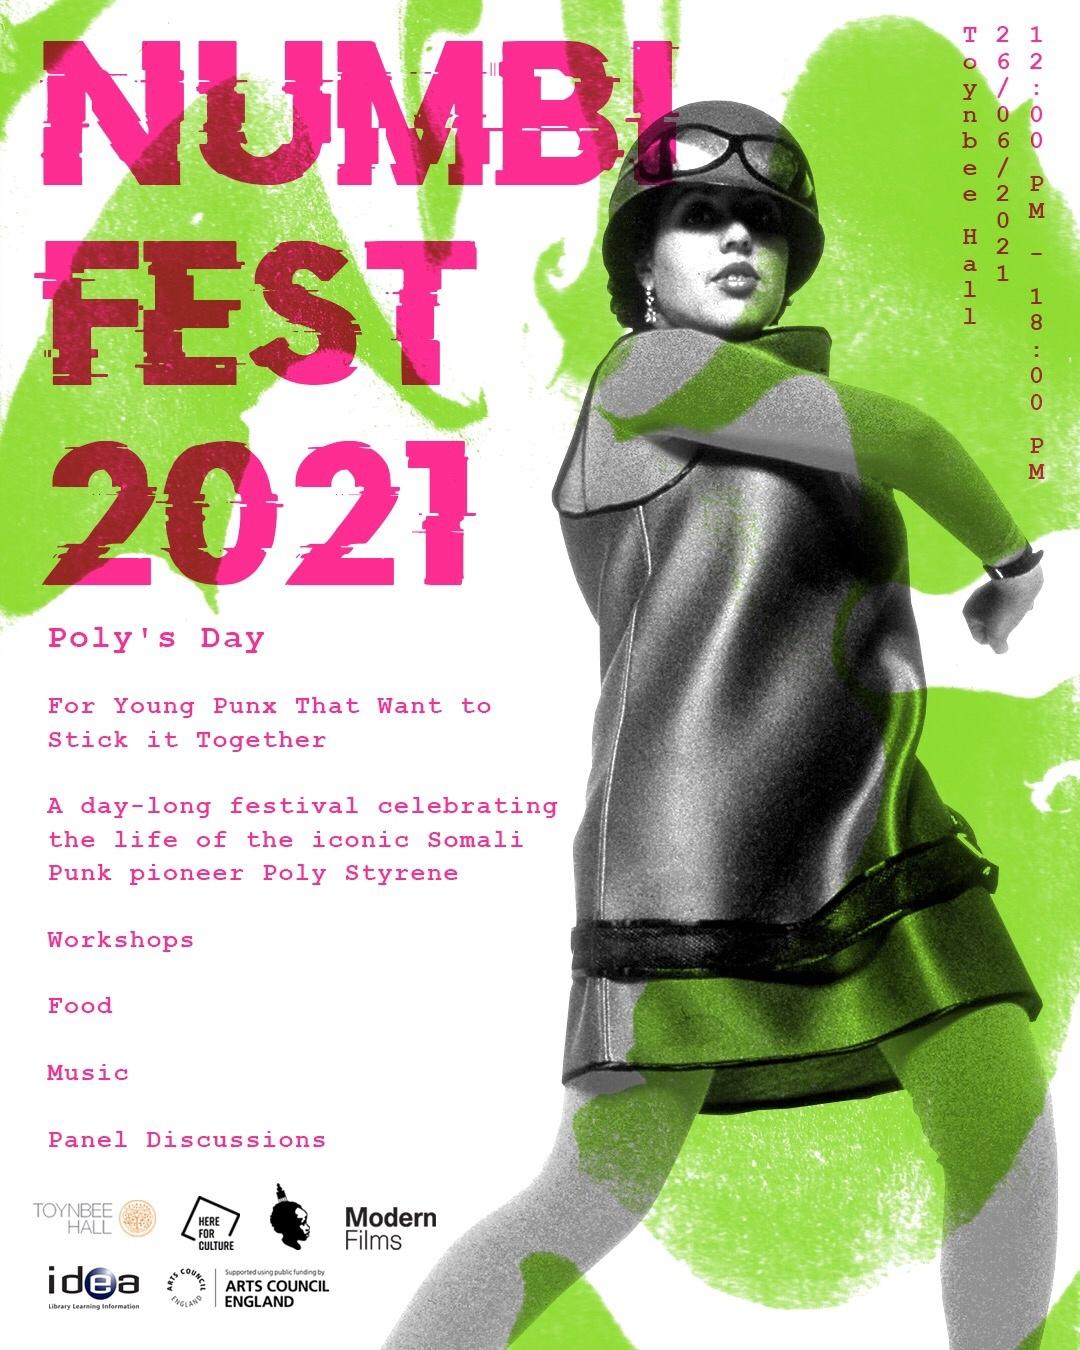 NumbiFest 2021 - Official flyer